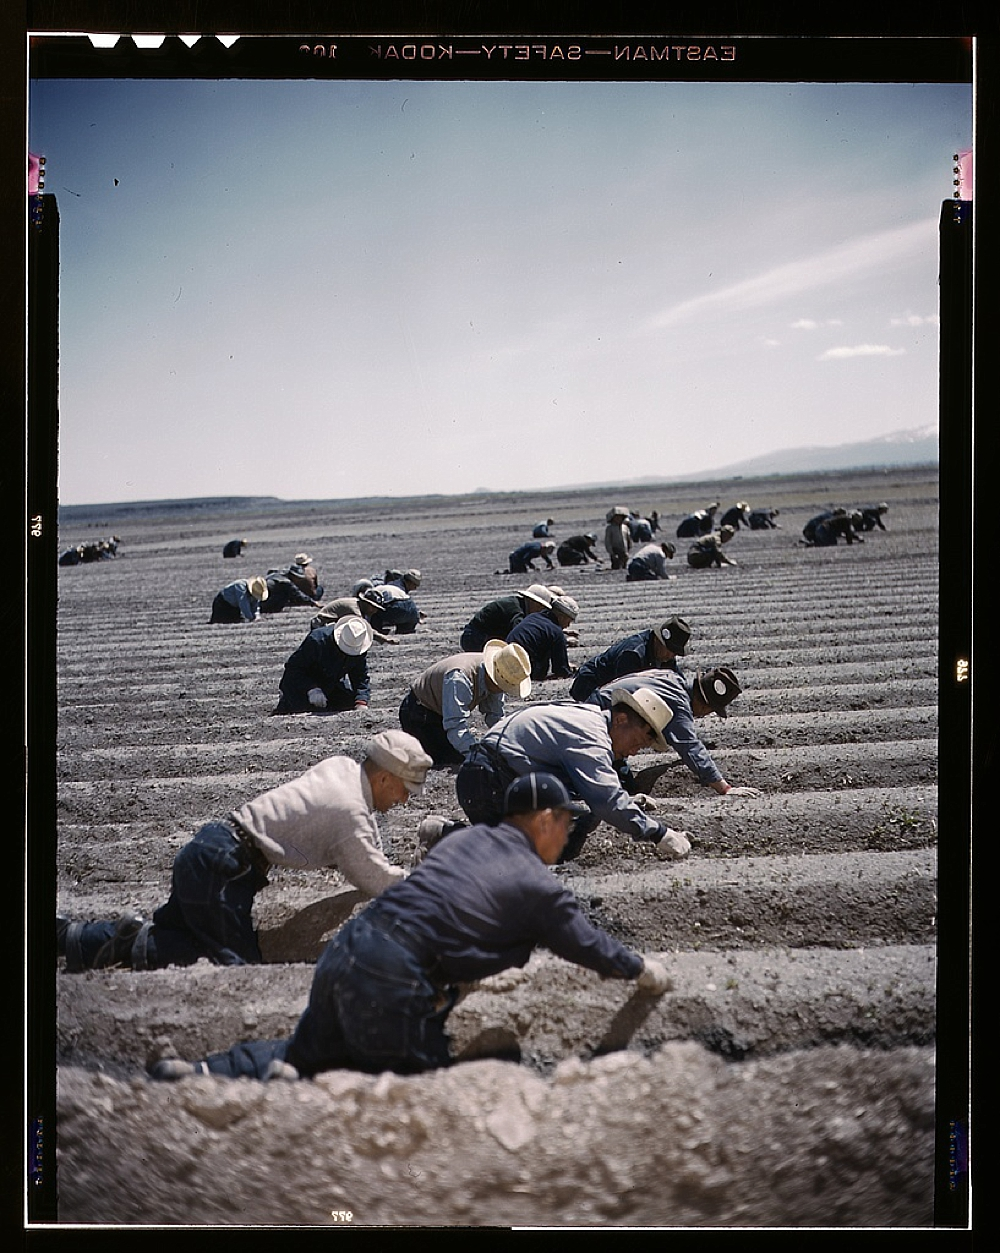 Japanese-American camp, war emergency evacuation